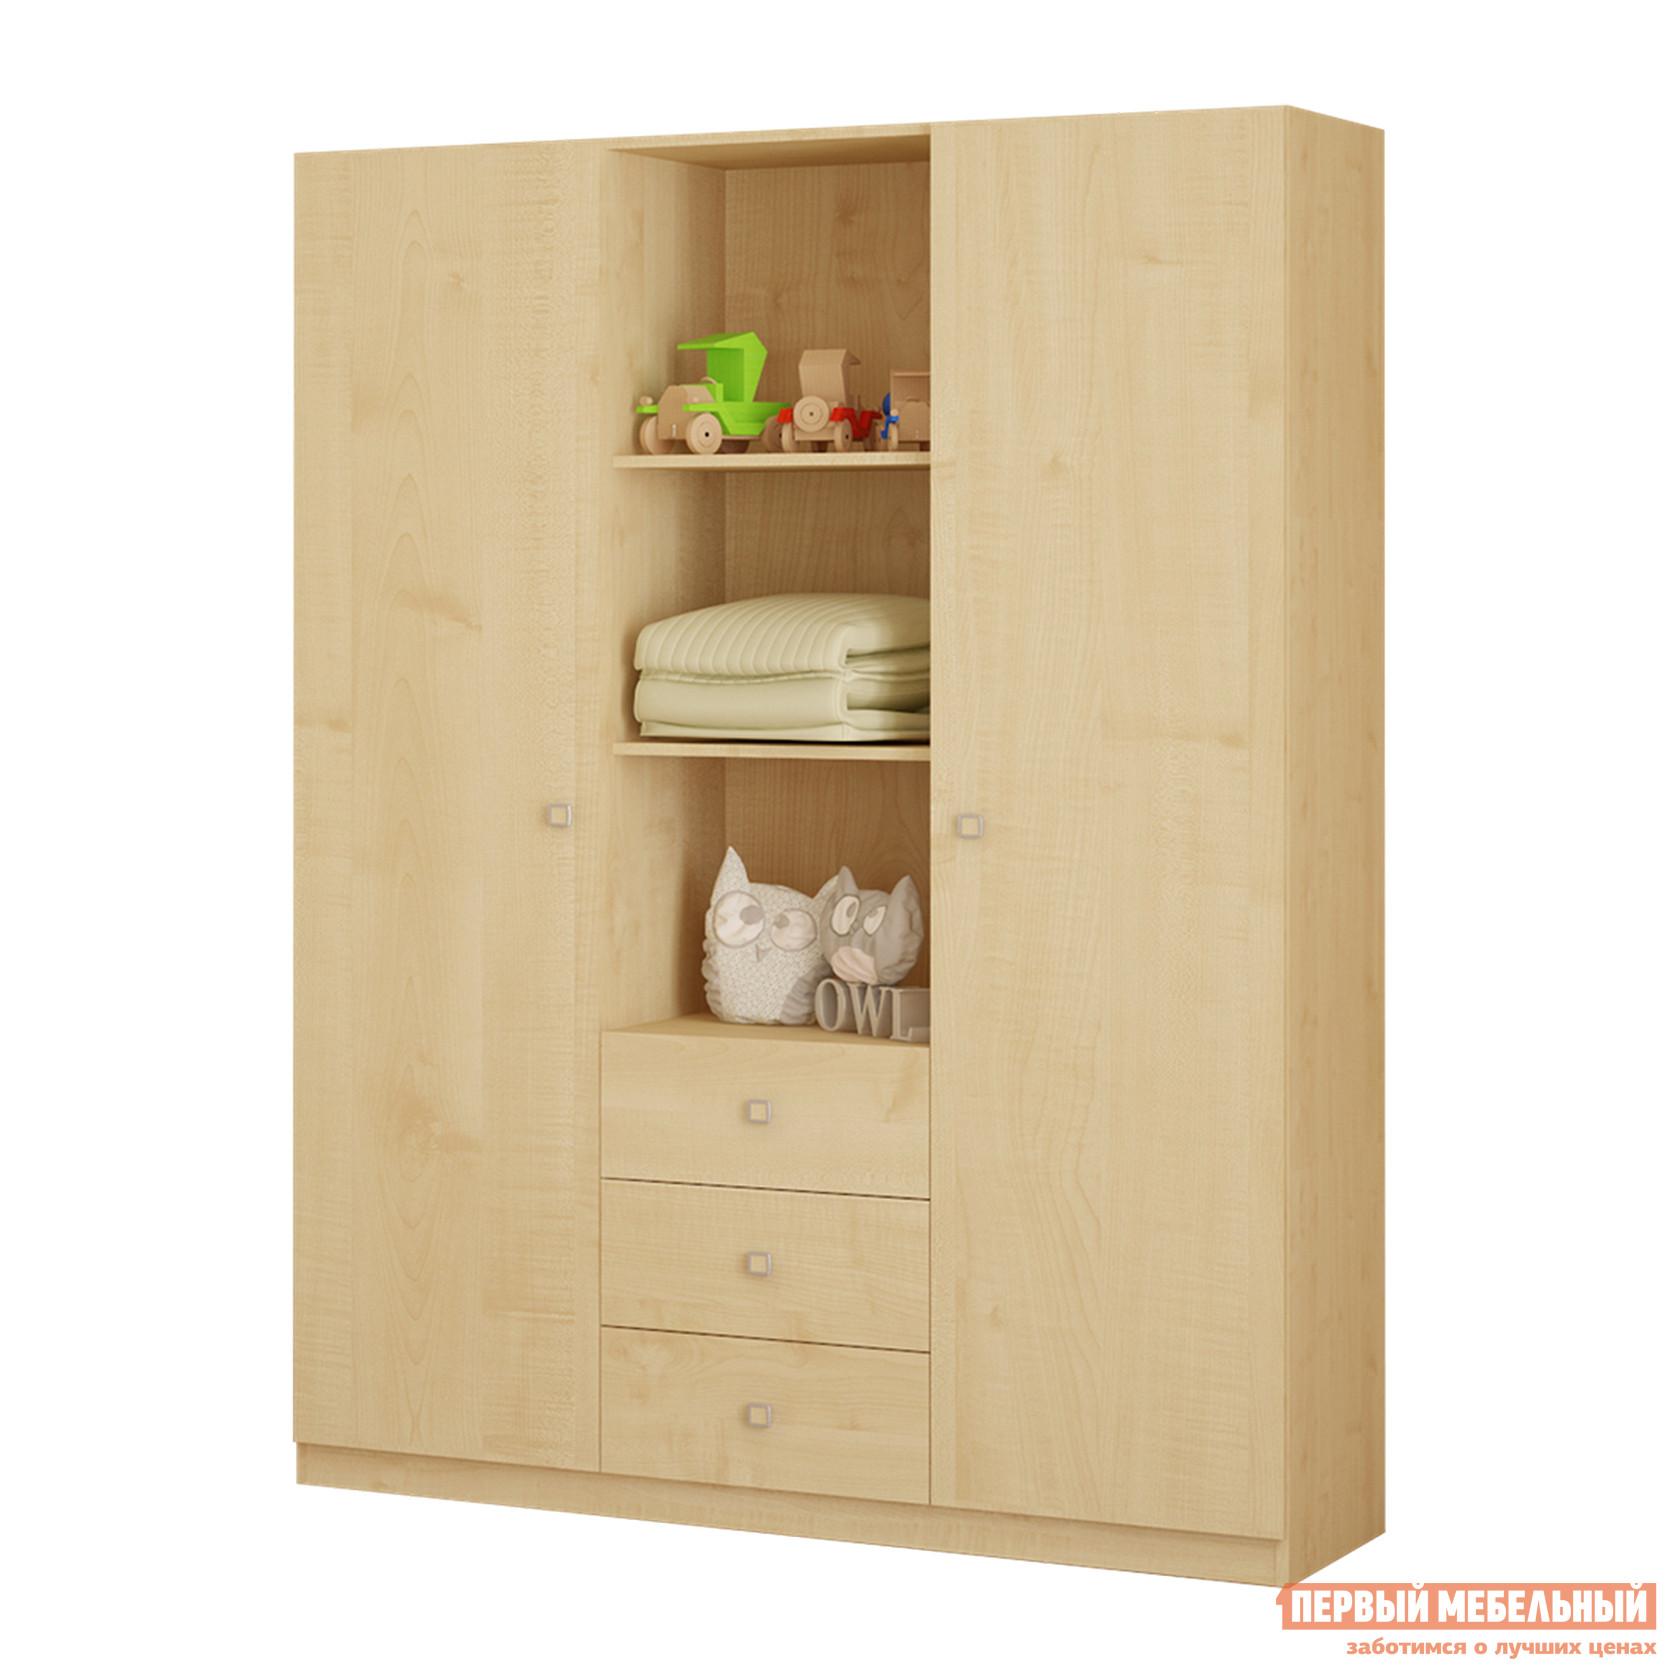 Шкаф детский ВПК Шкаф трехсекционный Polini kids Simple